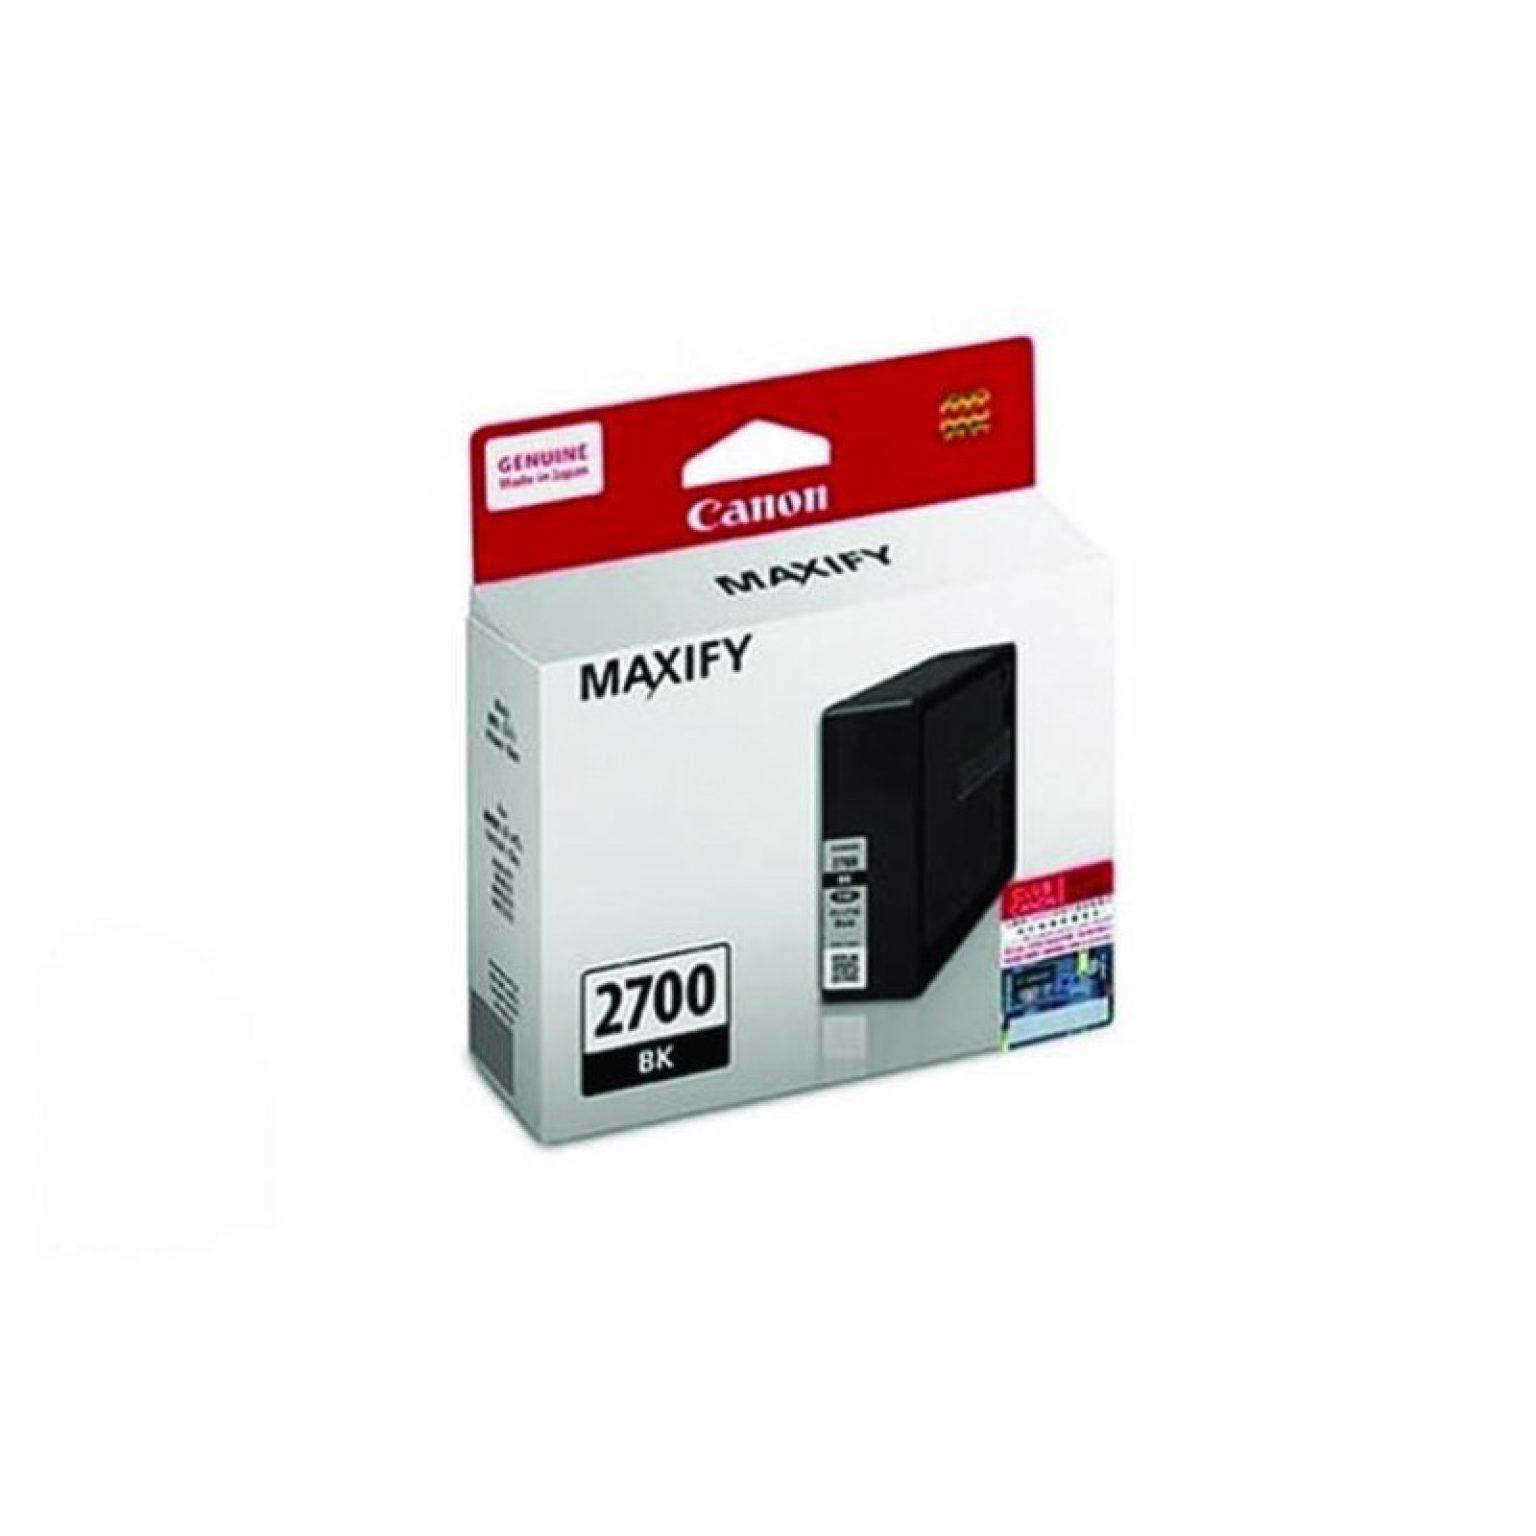 CANON - Ink Cartridge PGI-2700 Black for Maxify [PGI2700B]